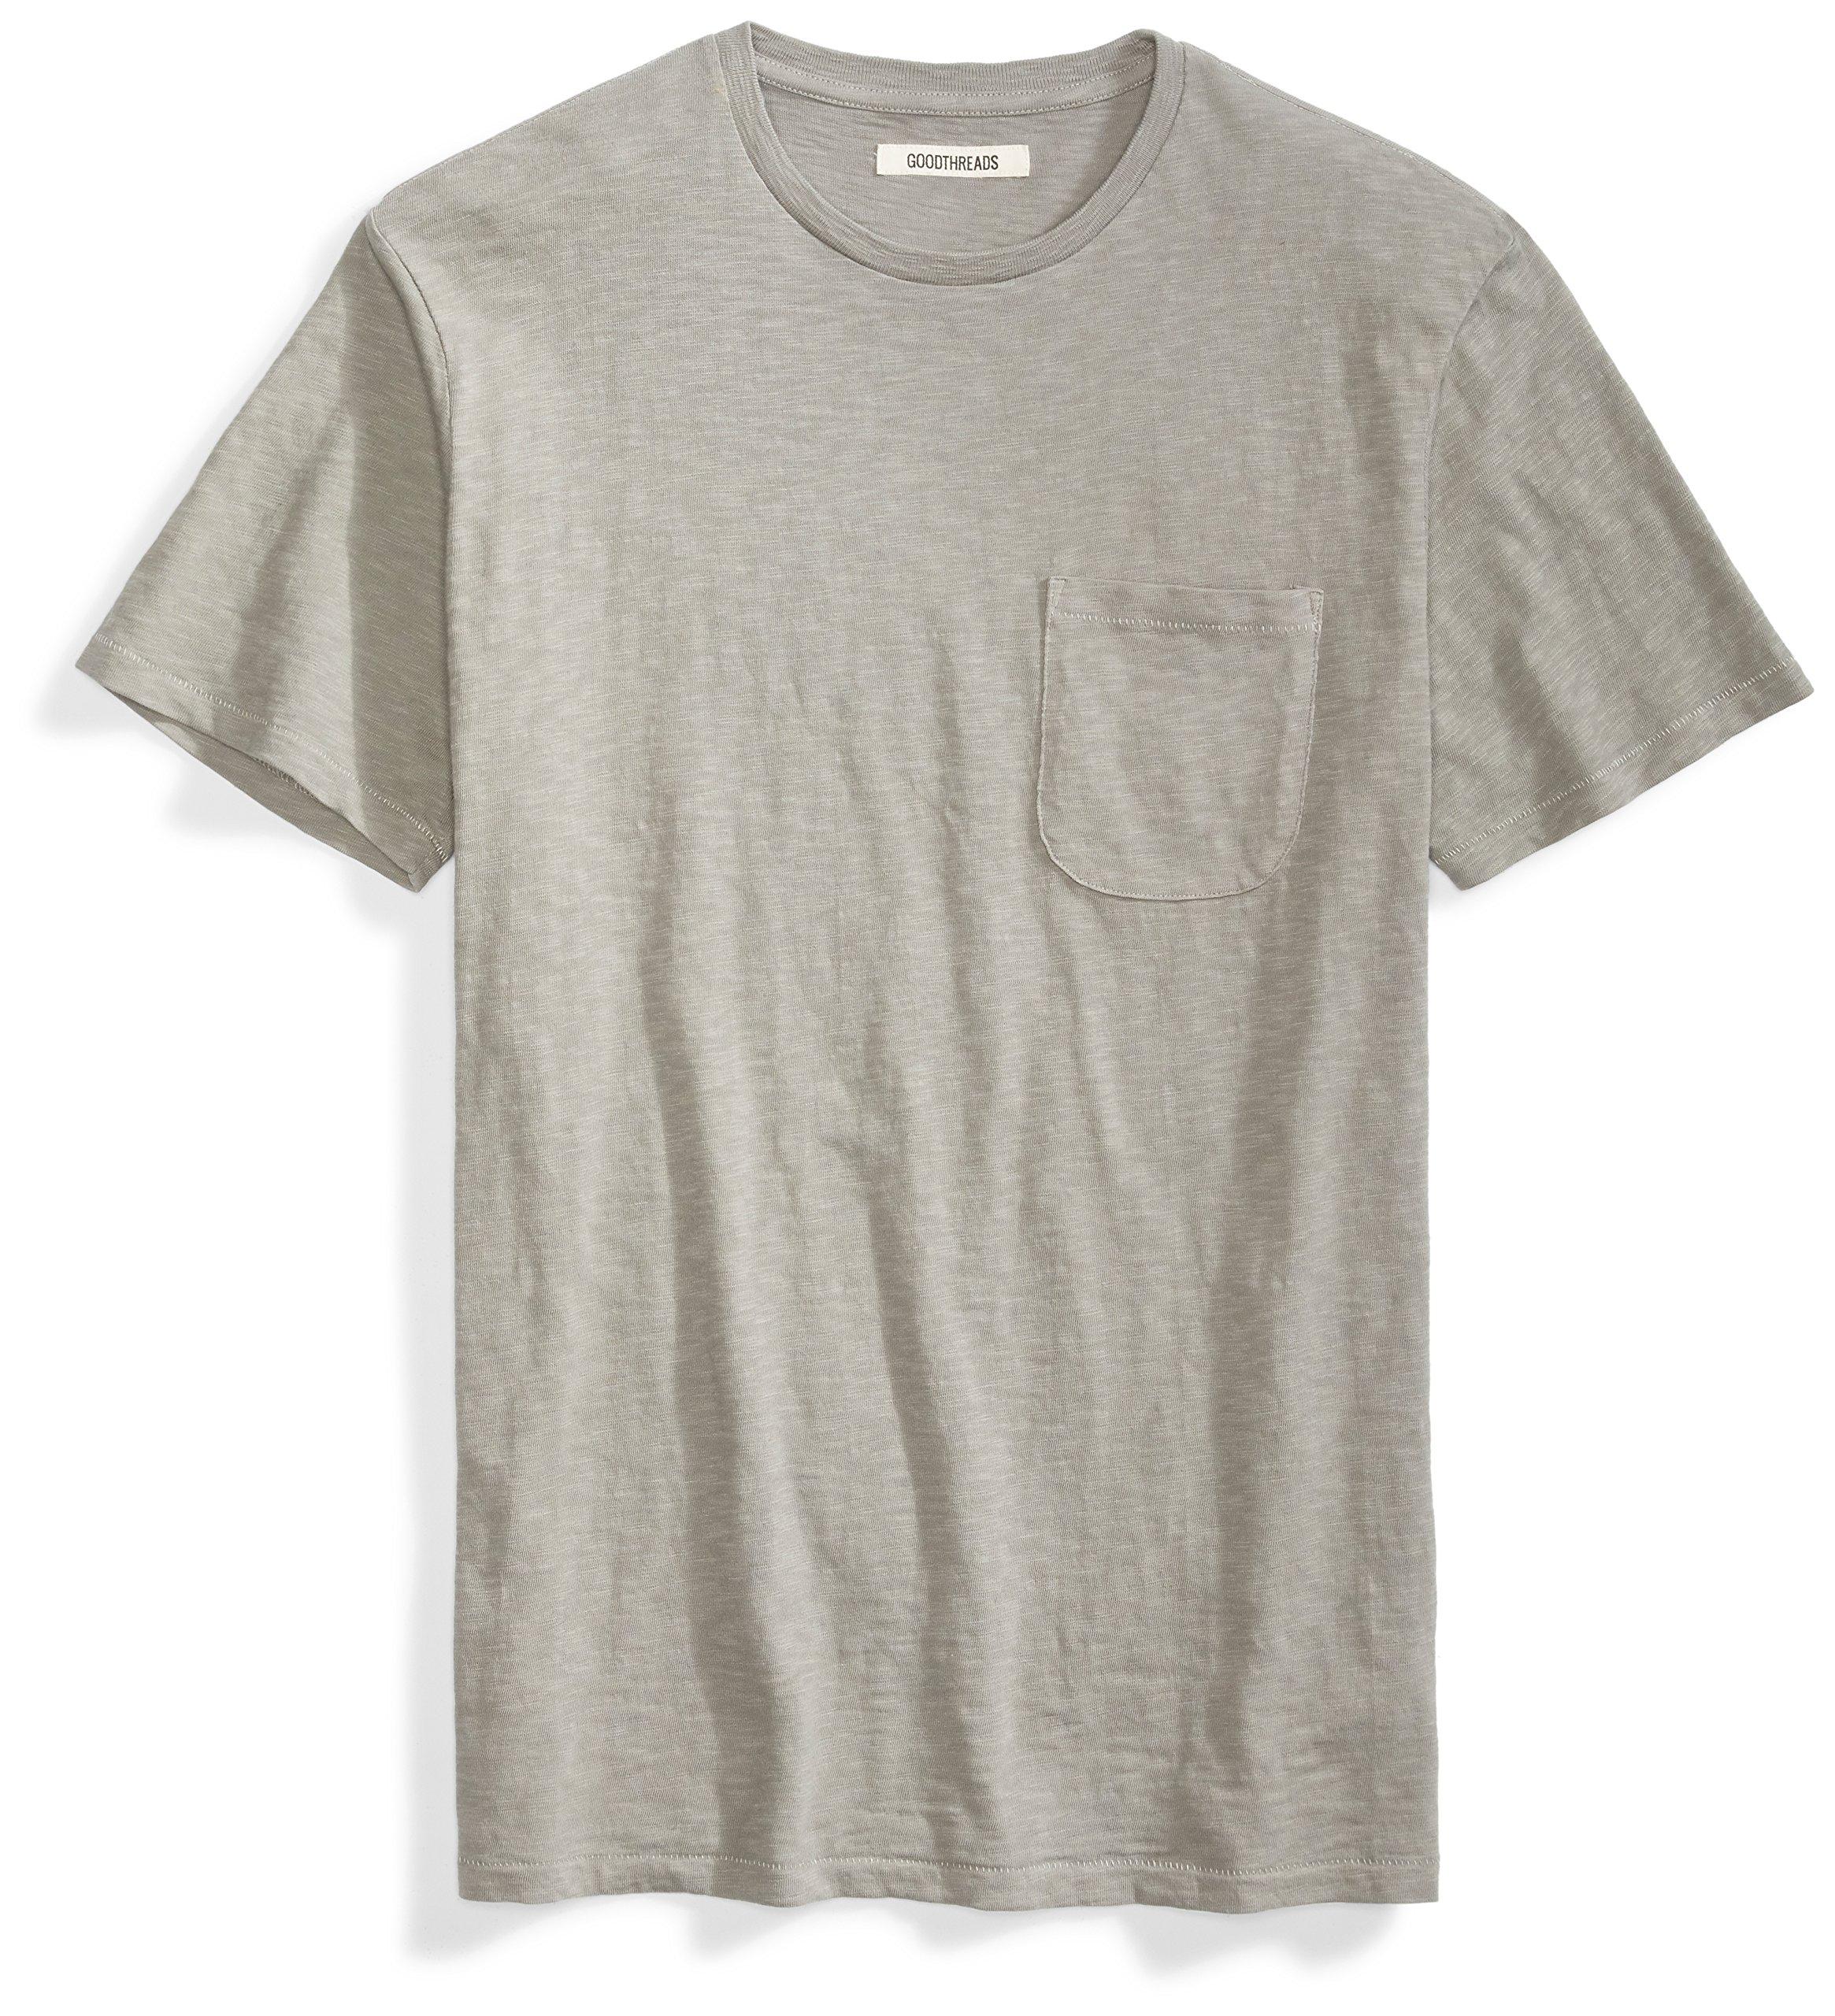 Goodthreads Men's Short-Sleeve Crewneck Slub Pocket T-Shirt, Castle Rock/Grey, Medium